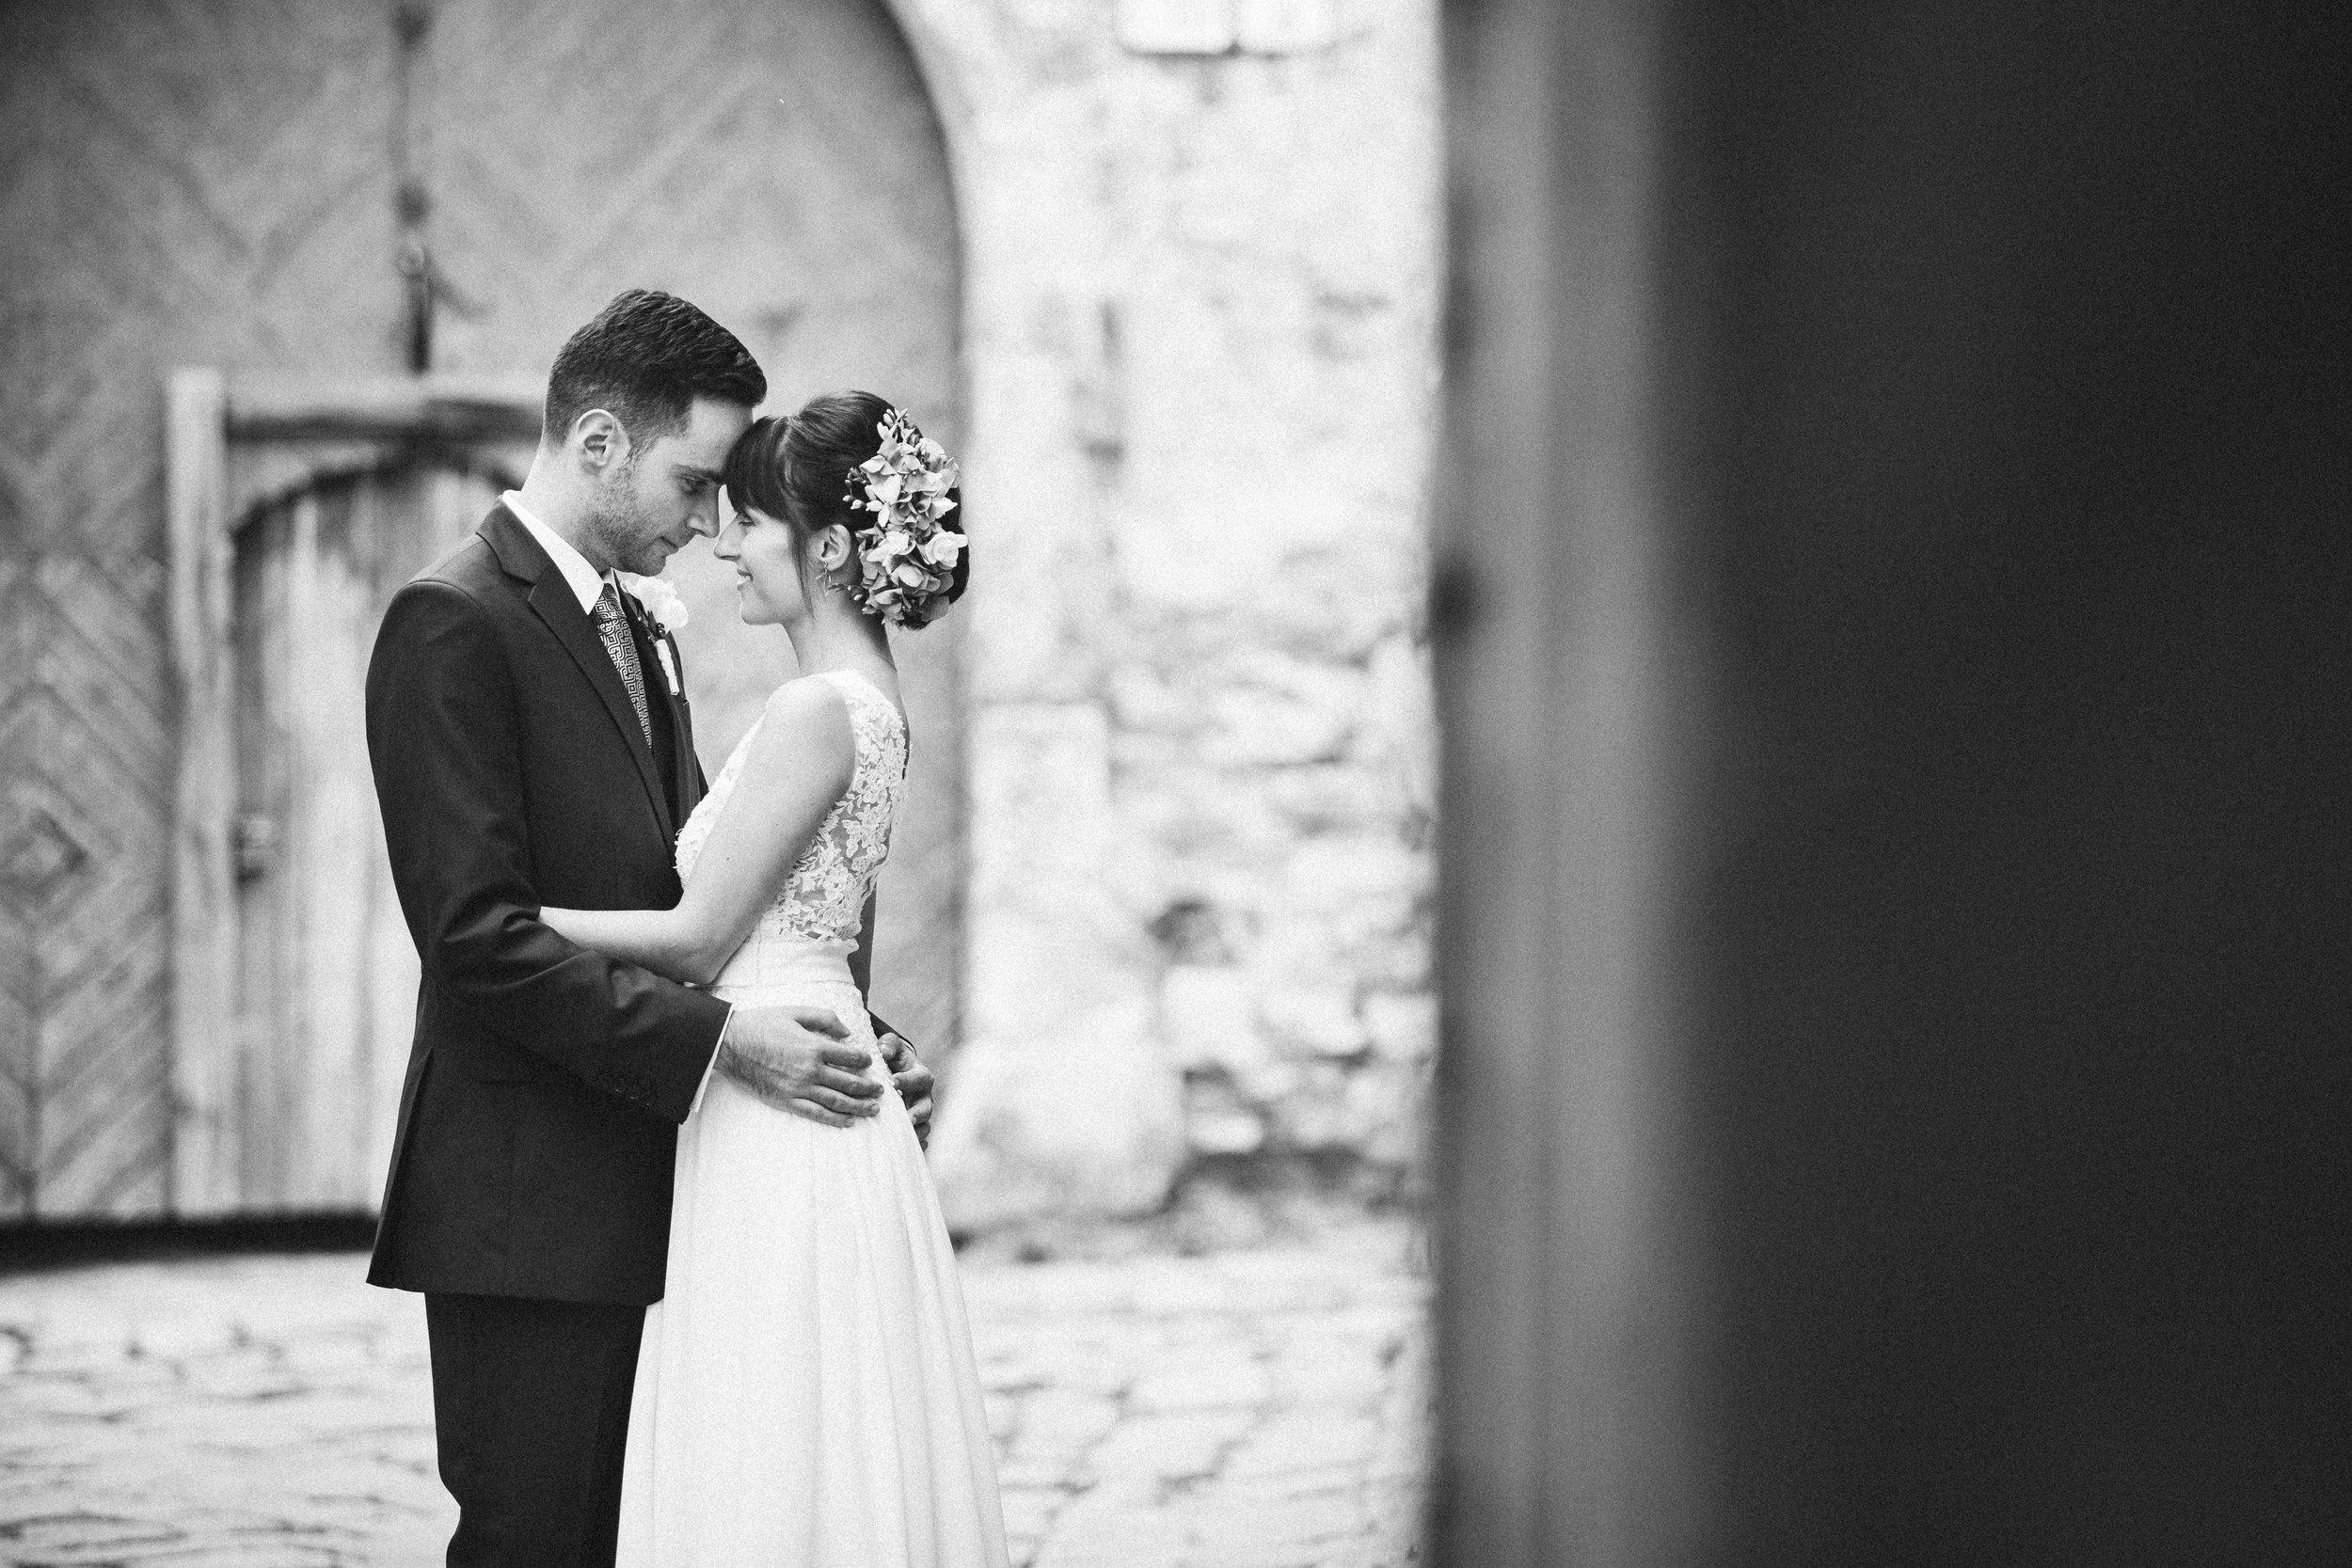 destination-wedding-photographer-bratislava-slovakia-europe-portrait-romantic-couple.jpg